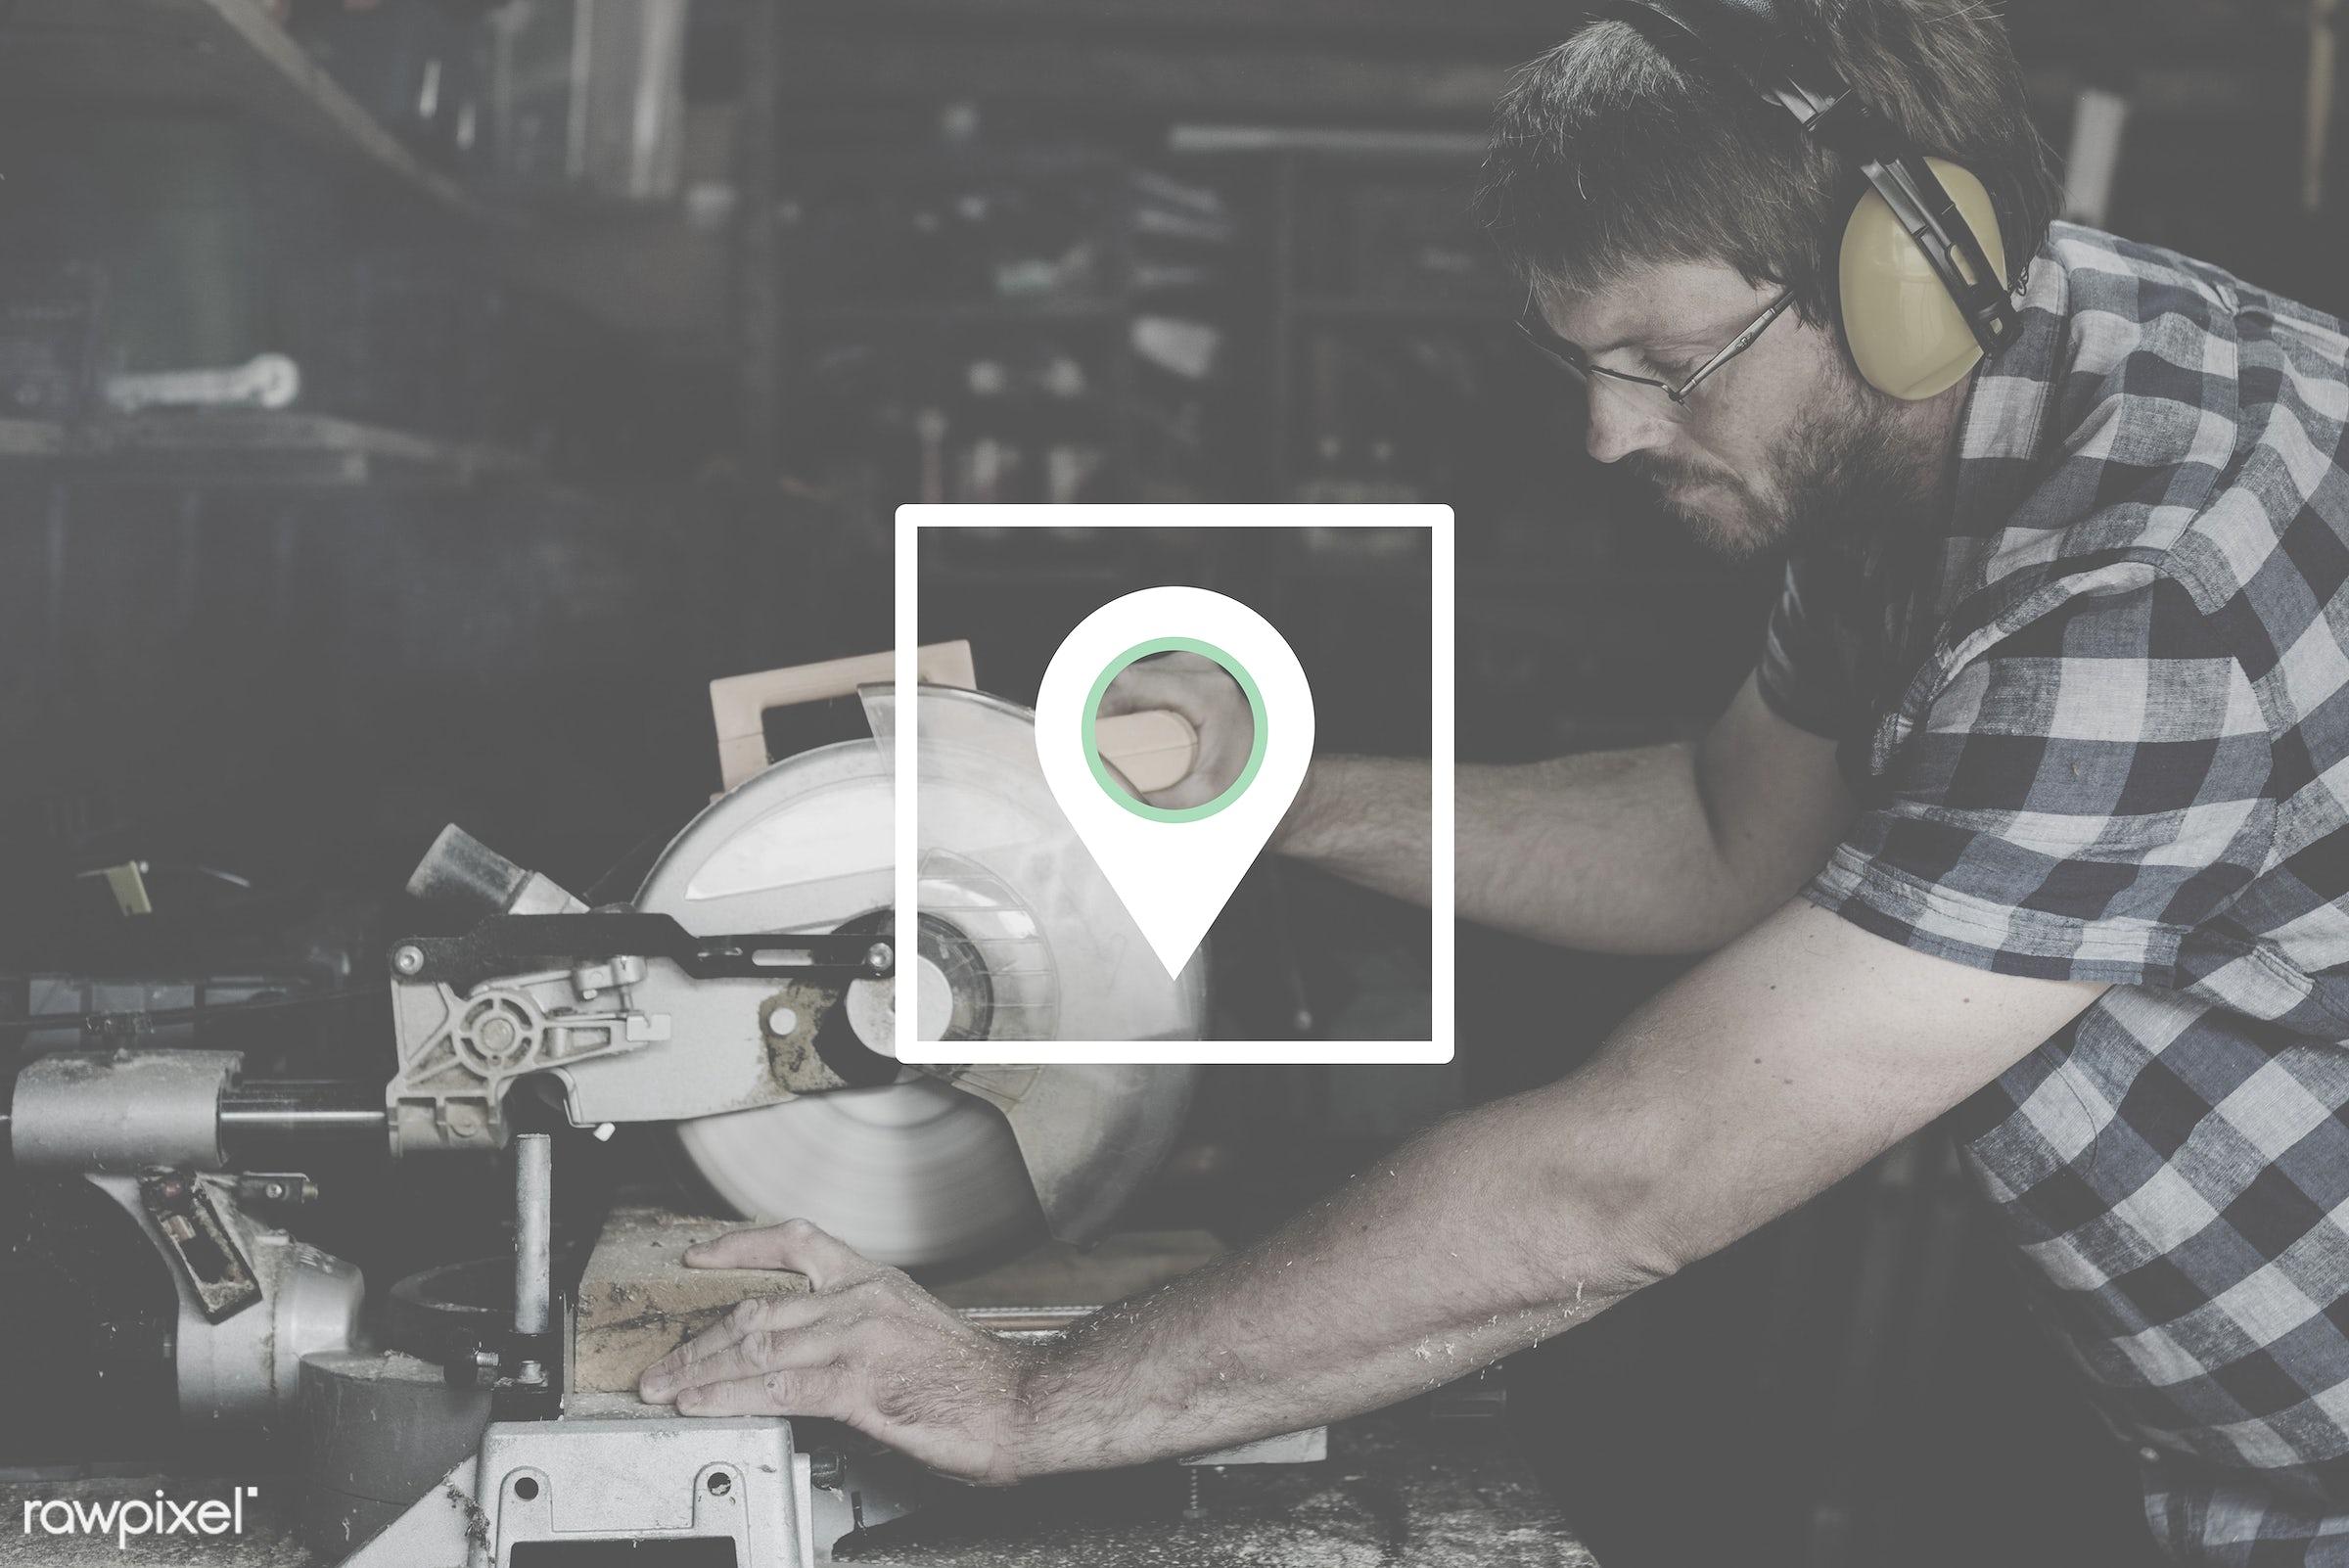 accuracy, badge, banner, blank, carpenter, carpentry, copy space, craft, craftsman, destination, direction, distance,...